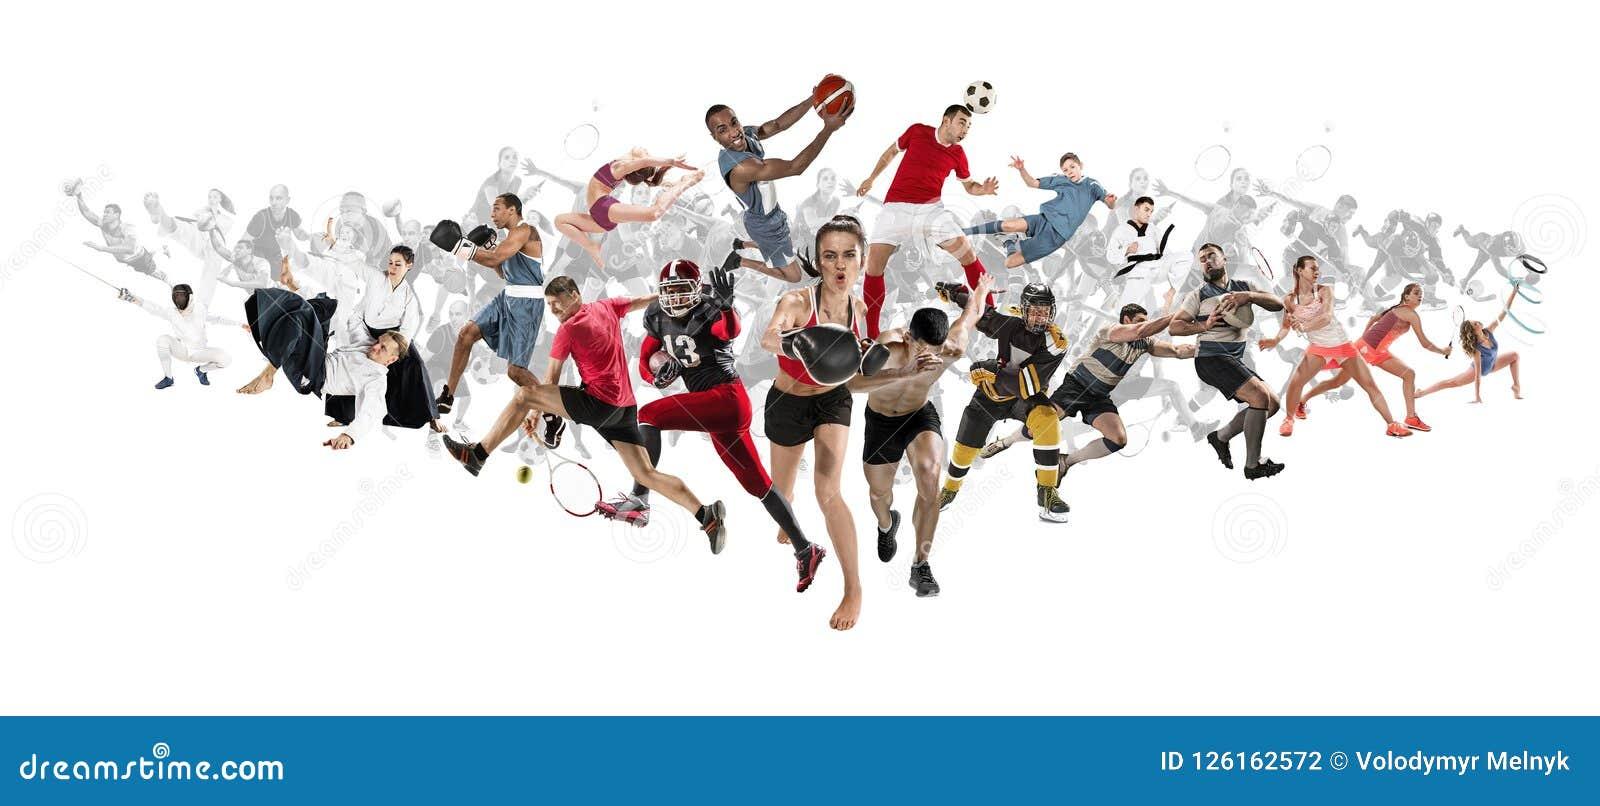 Folâtrez le collage au sujet de kickboxing, le football, football américain, basket-ball, hockey sur glace, badminton, le Taekwon